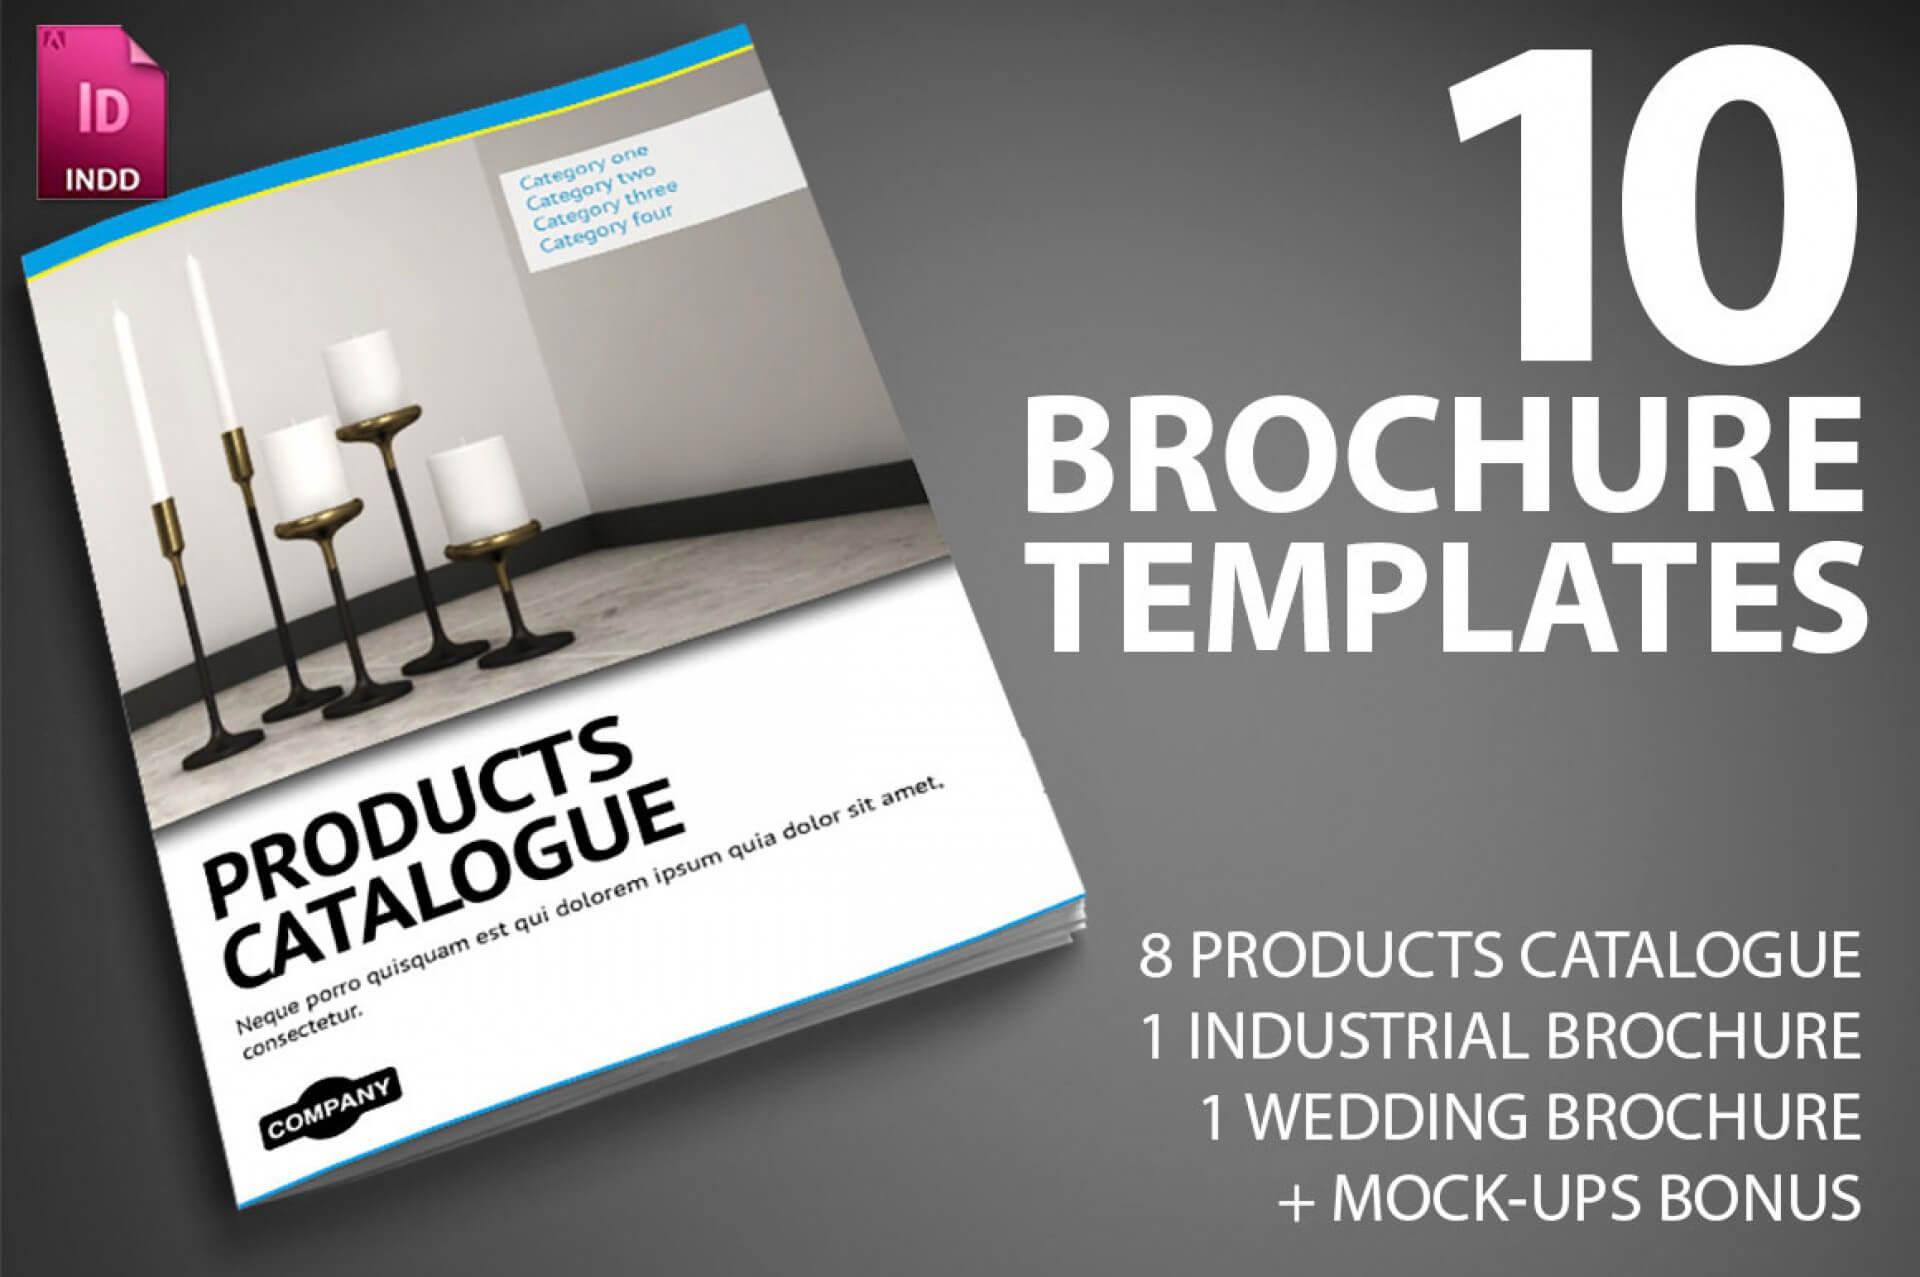 002 Indesign Brochure Template Free Stirring Ideas A4 for Brochure Template Indesign Free Download